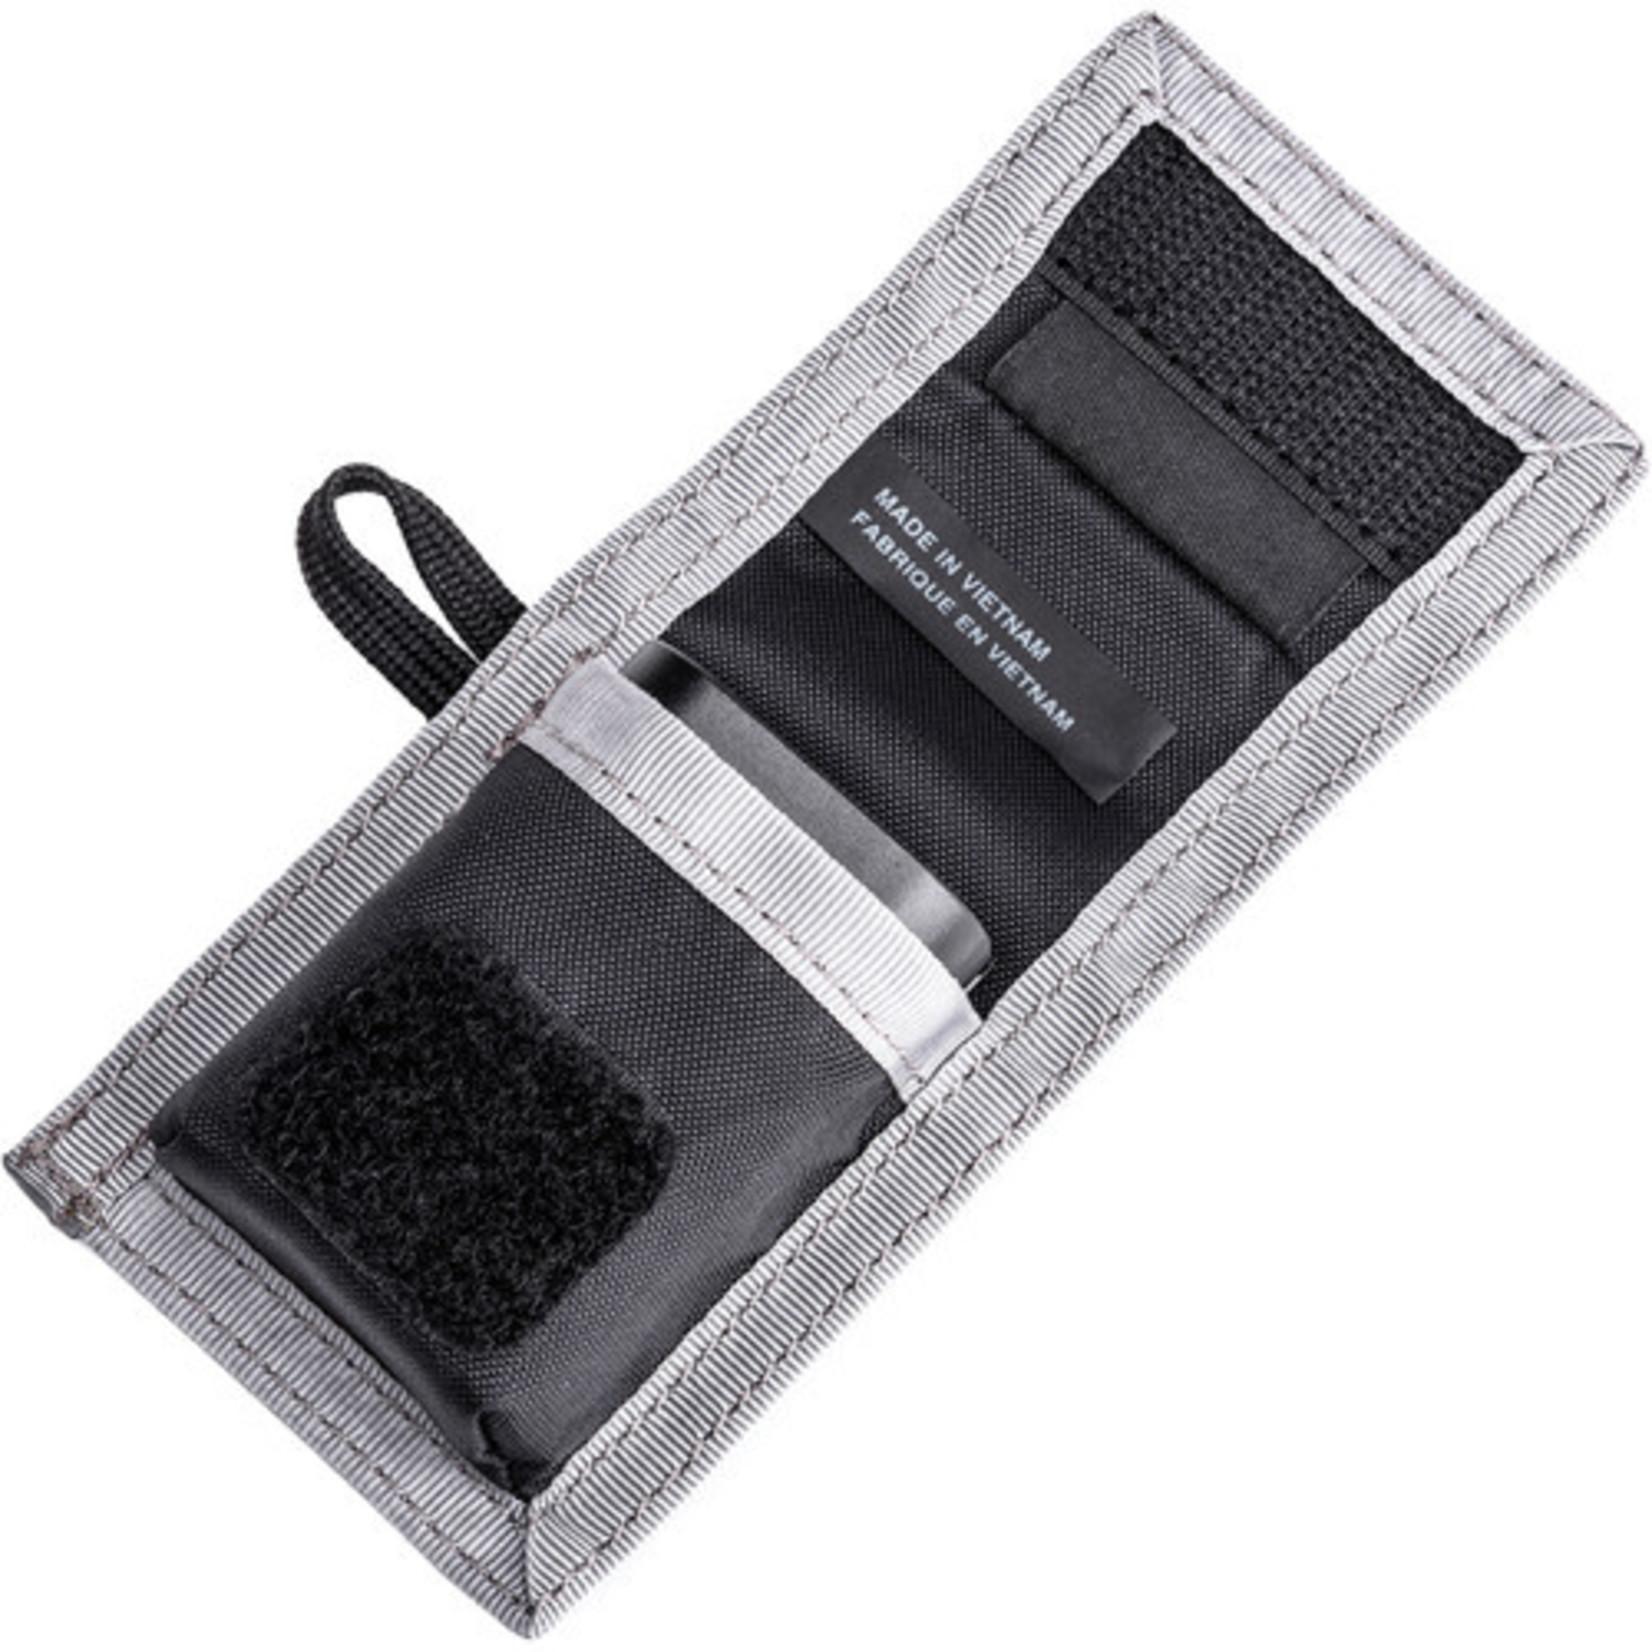 ThinkTank CF/SD Battery Case